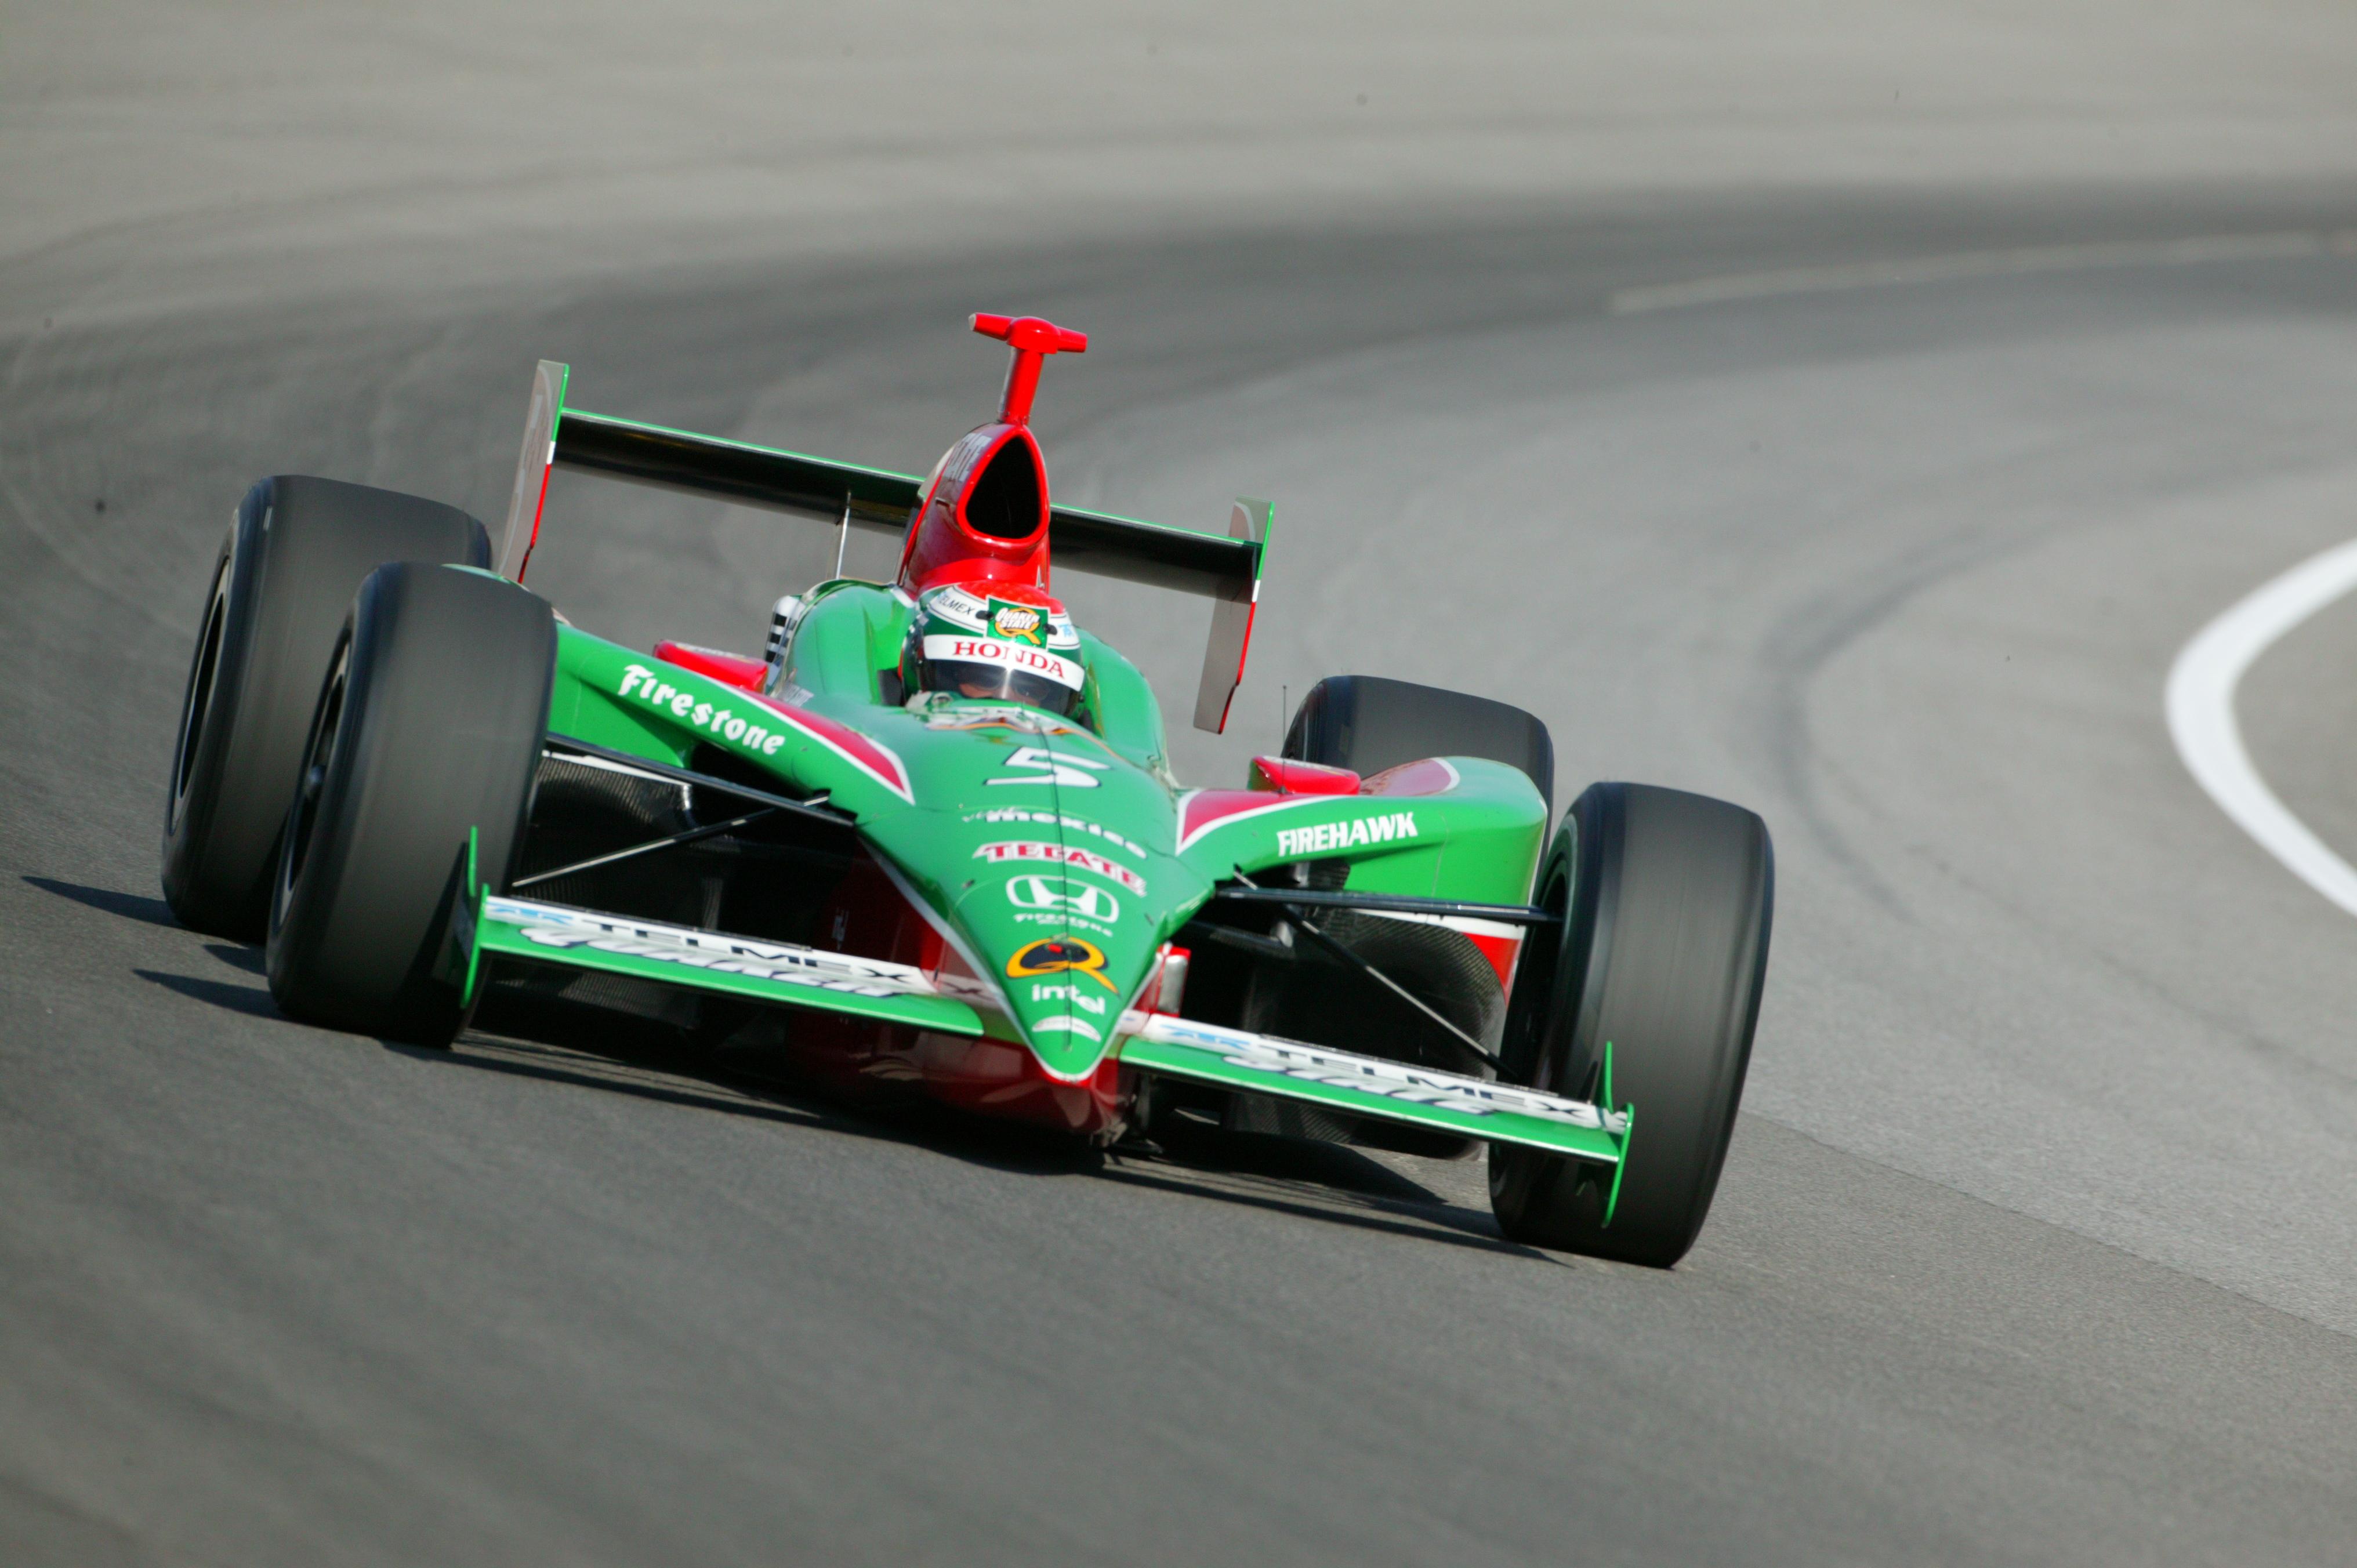 Adrian Fernandez Indianapolis 500 IndyCar